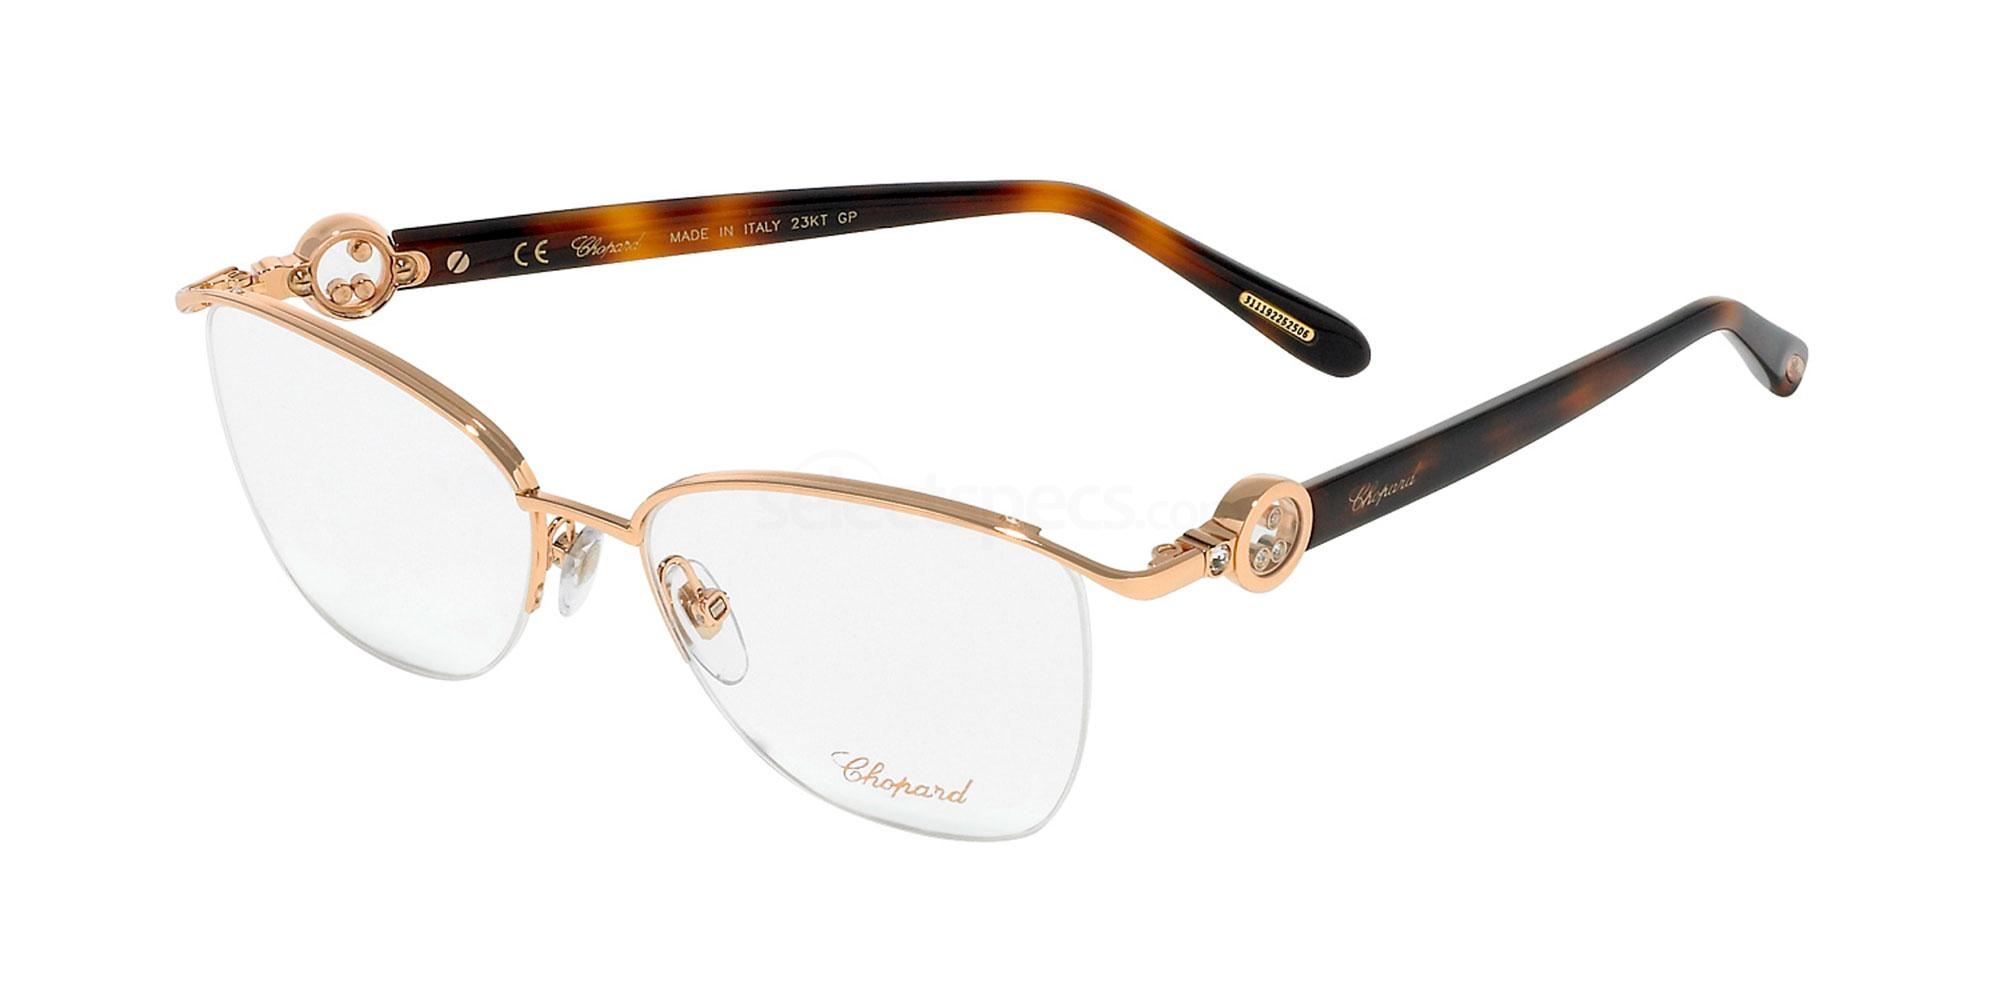 08FC VCHC54S Glasses, Chopard